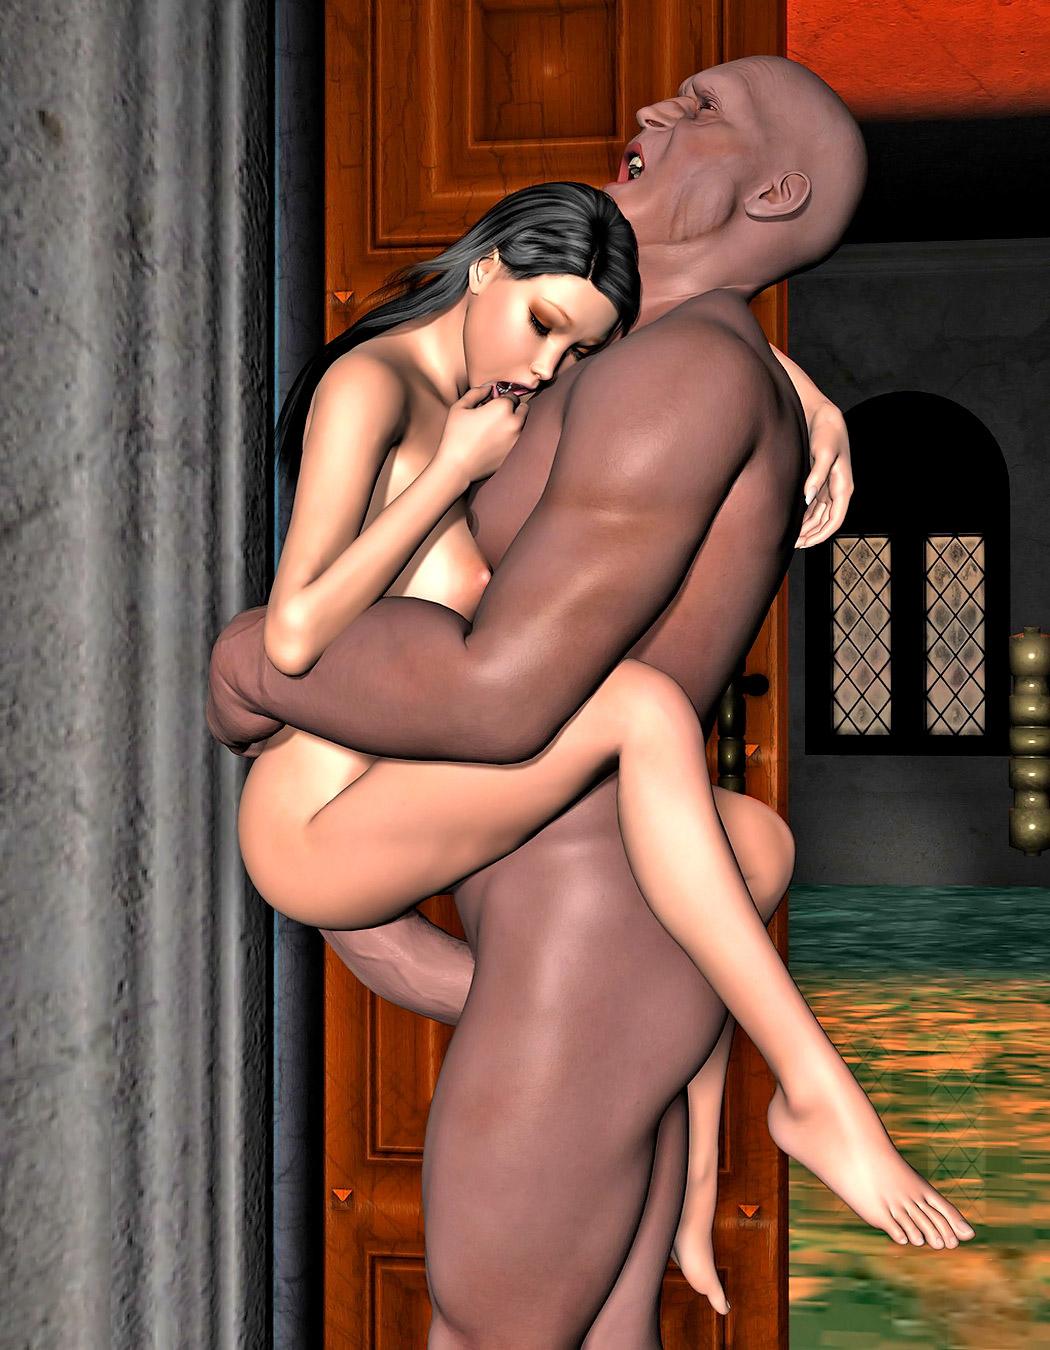 Arab Princess Porn princess peach cartoon porn - megapornx